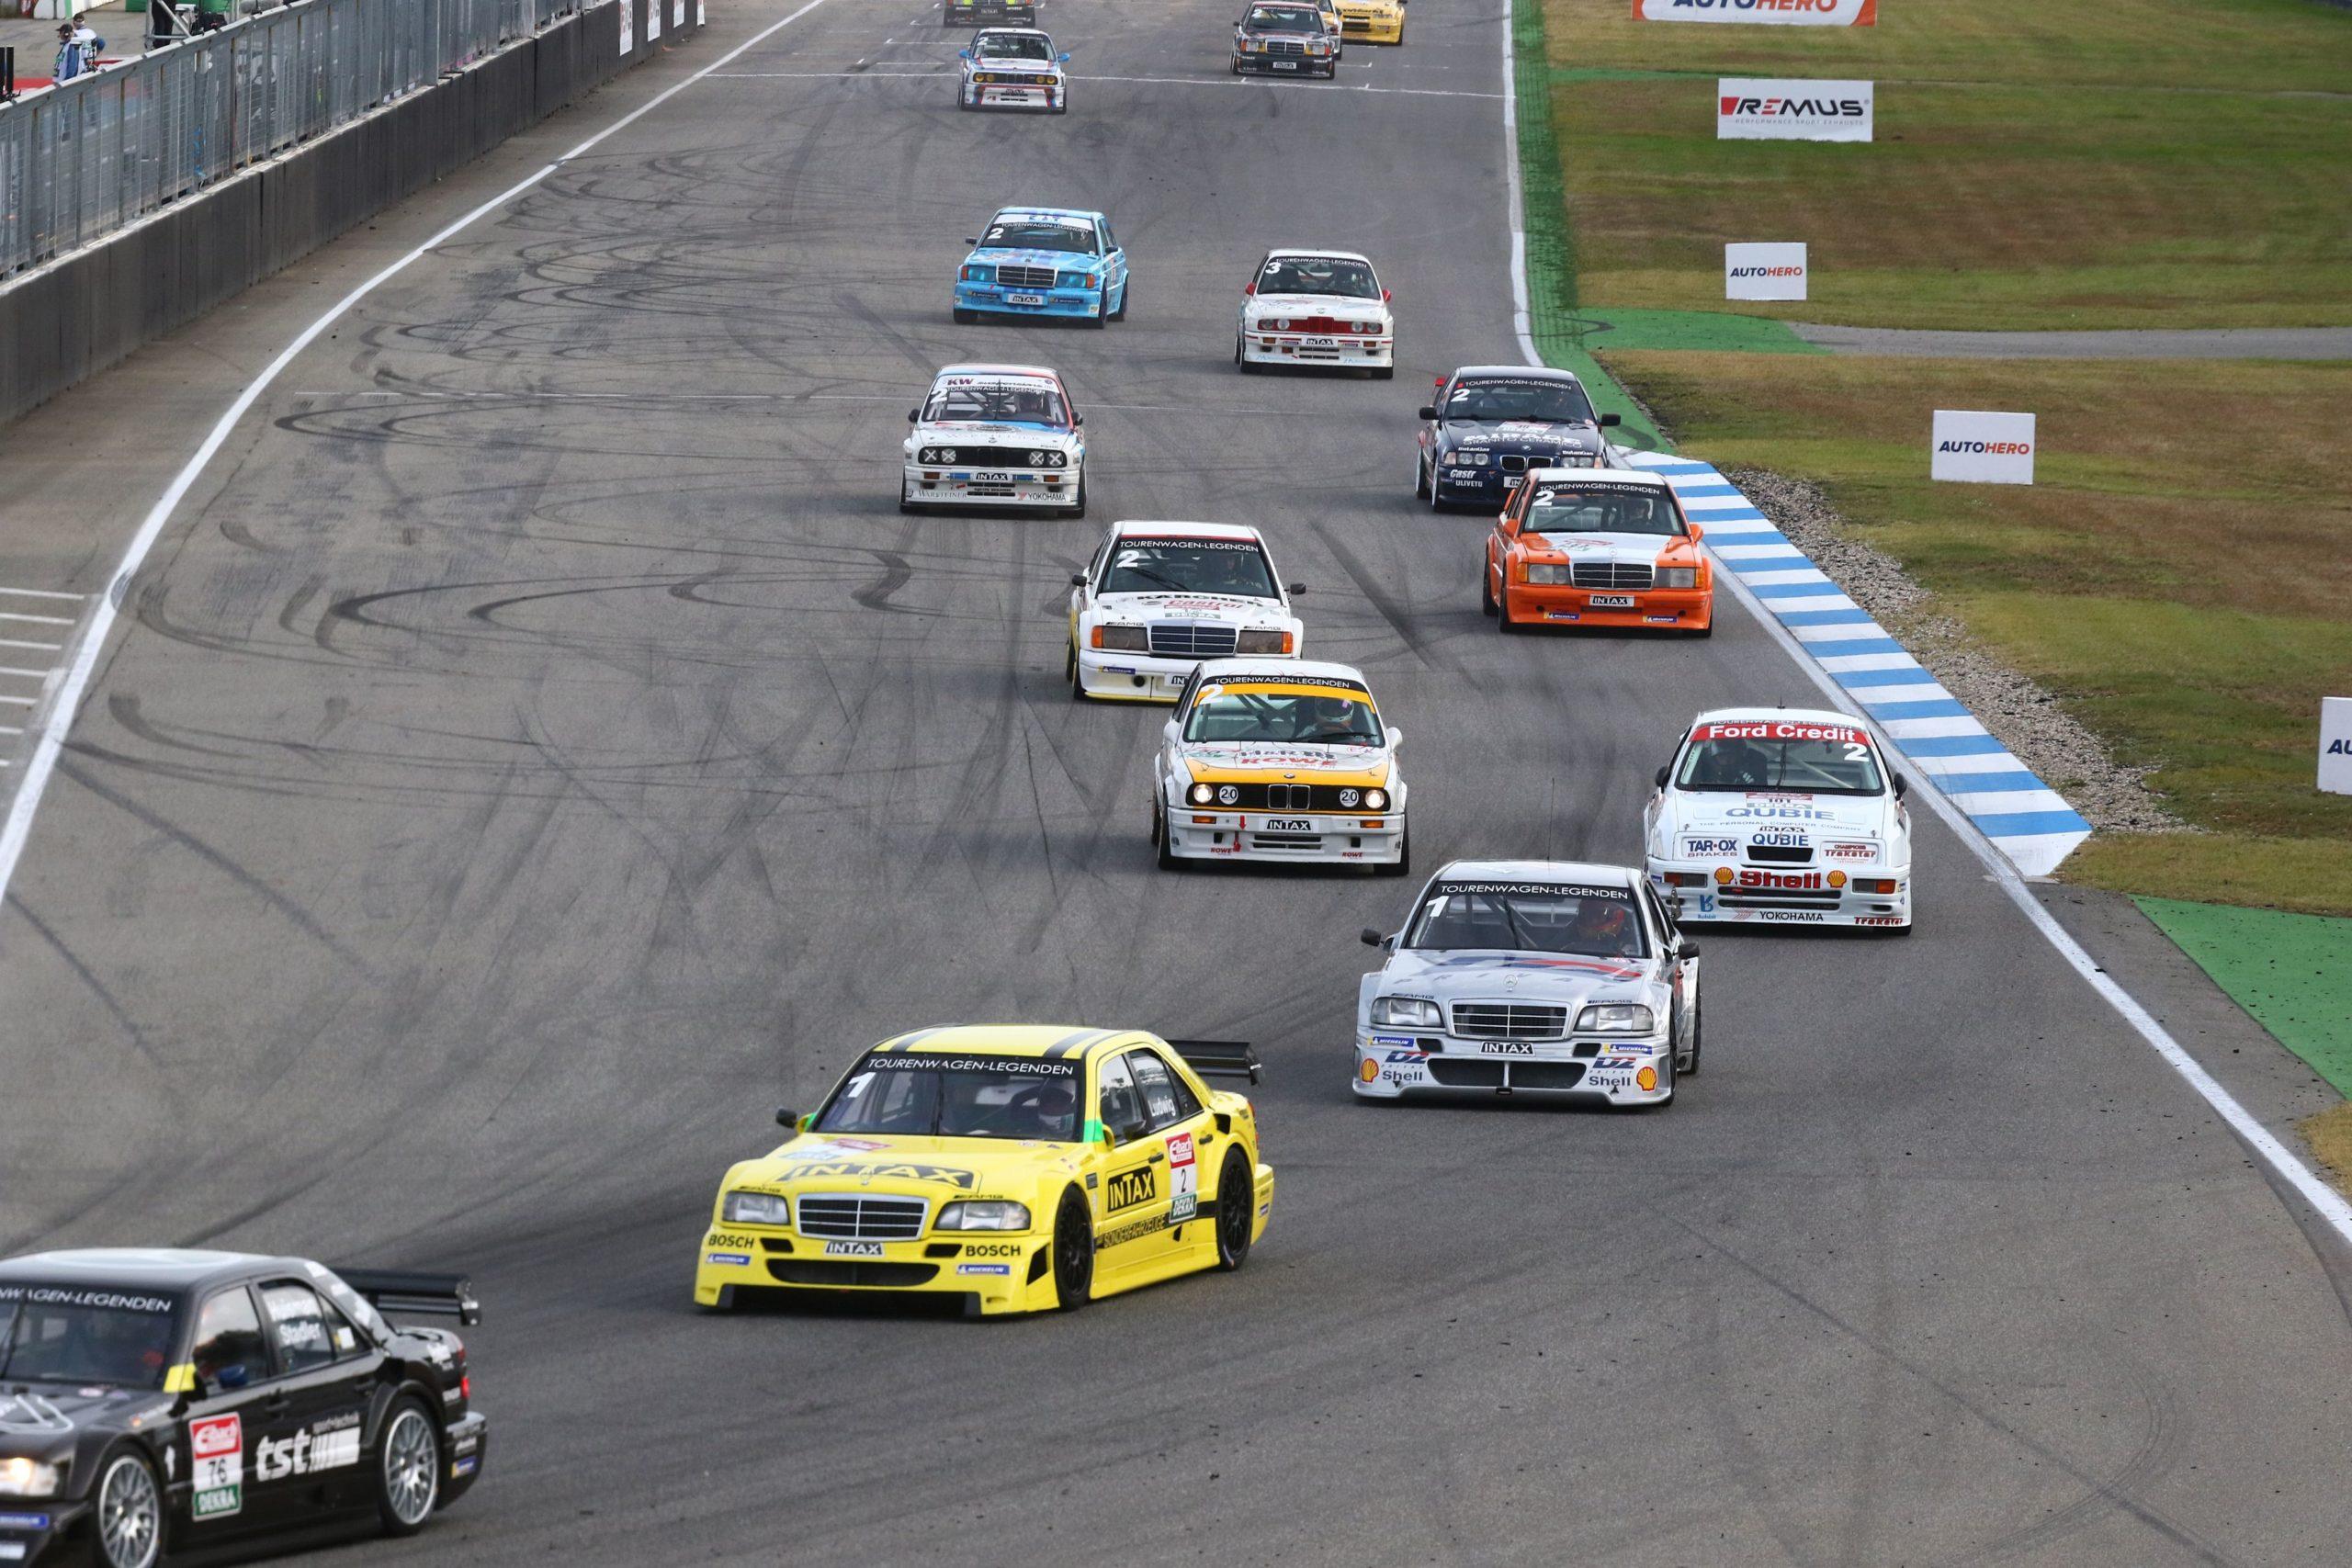 DTM-Classic-tst-sport-und-technik-Mercedes-Benz-Klaus-Ludwig-2128219